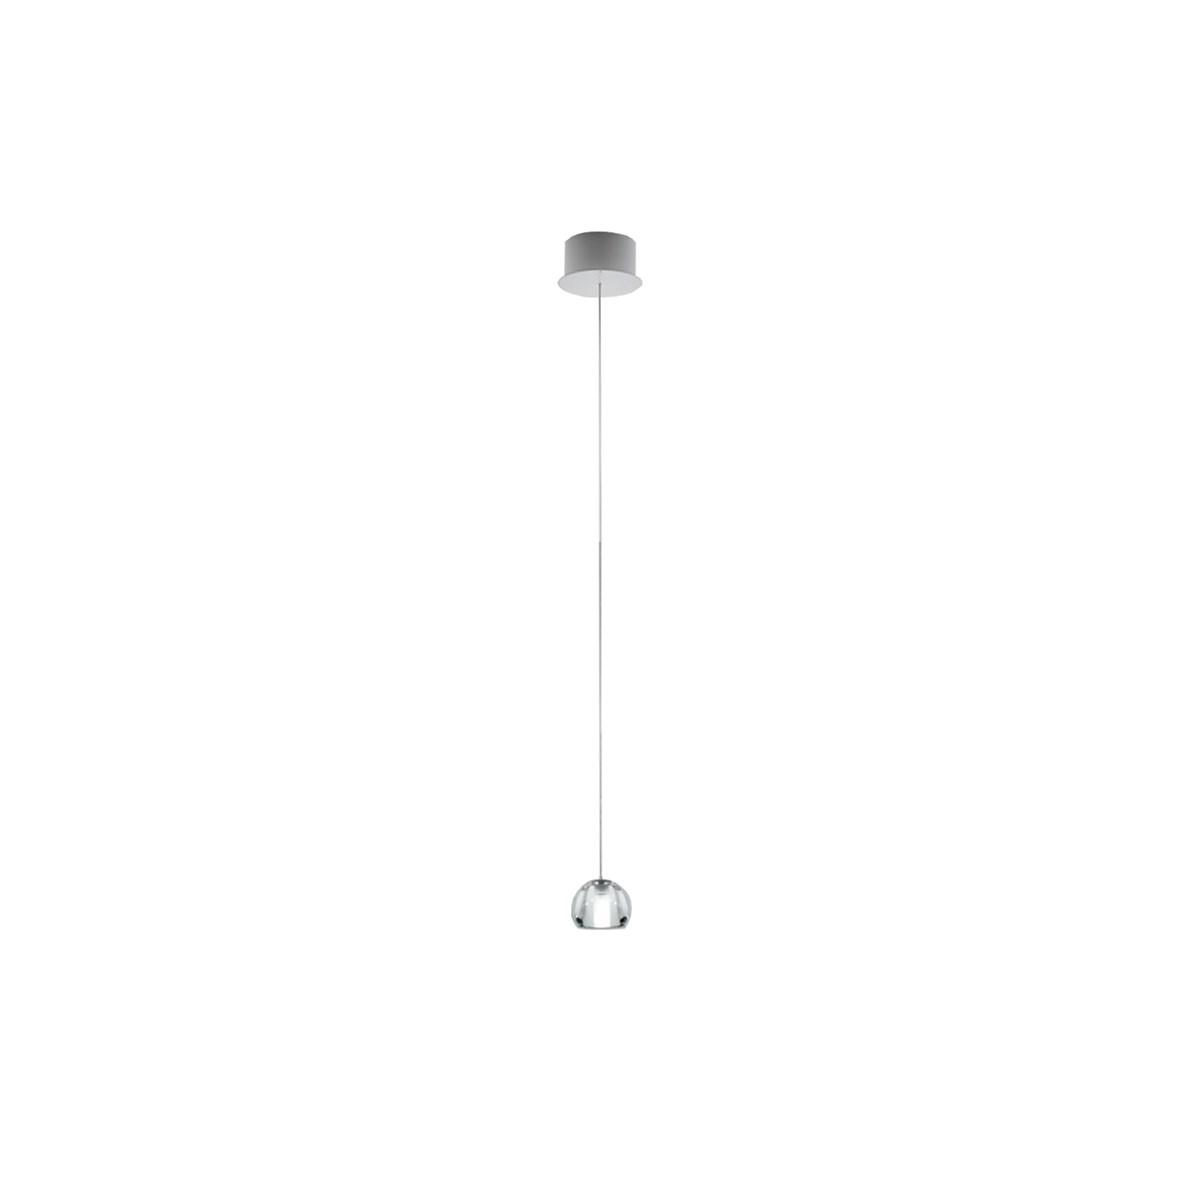 Fabbian-Marc-Sadler-Multispot-Beluga-Pendant-Light-Matisse-1